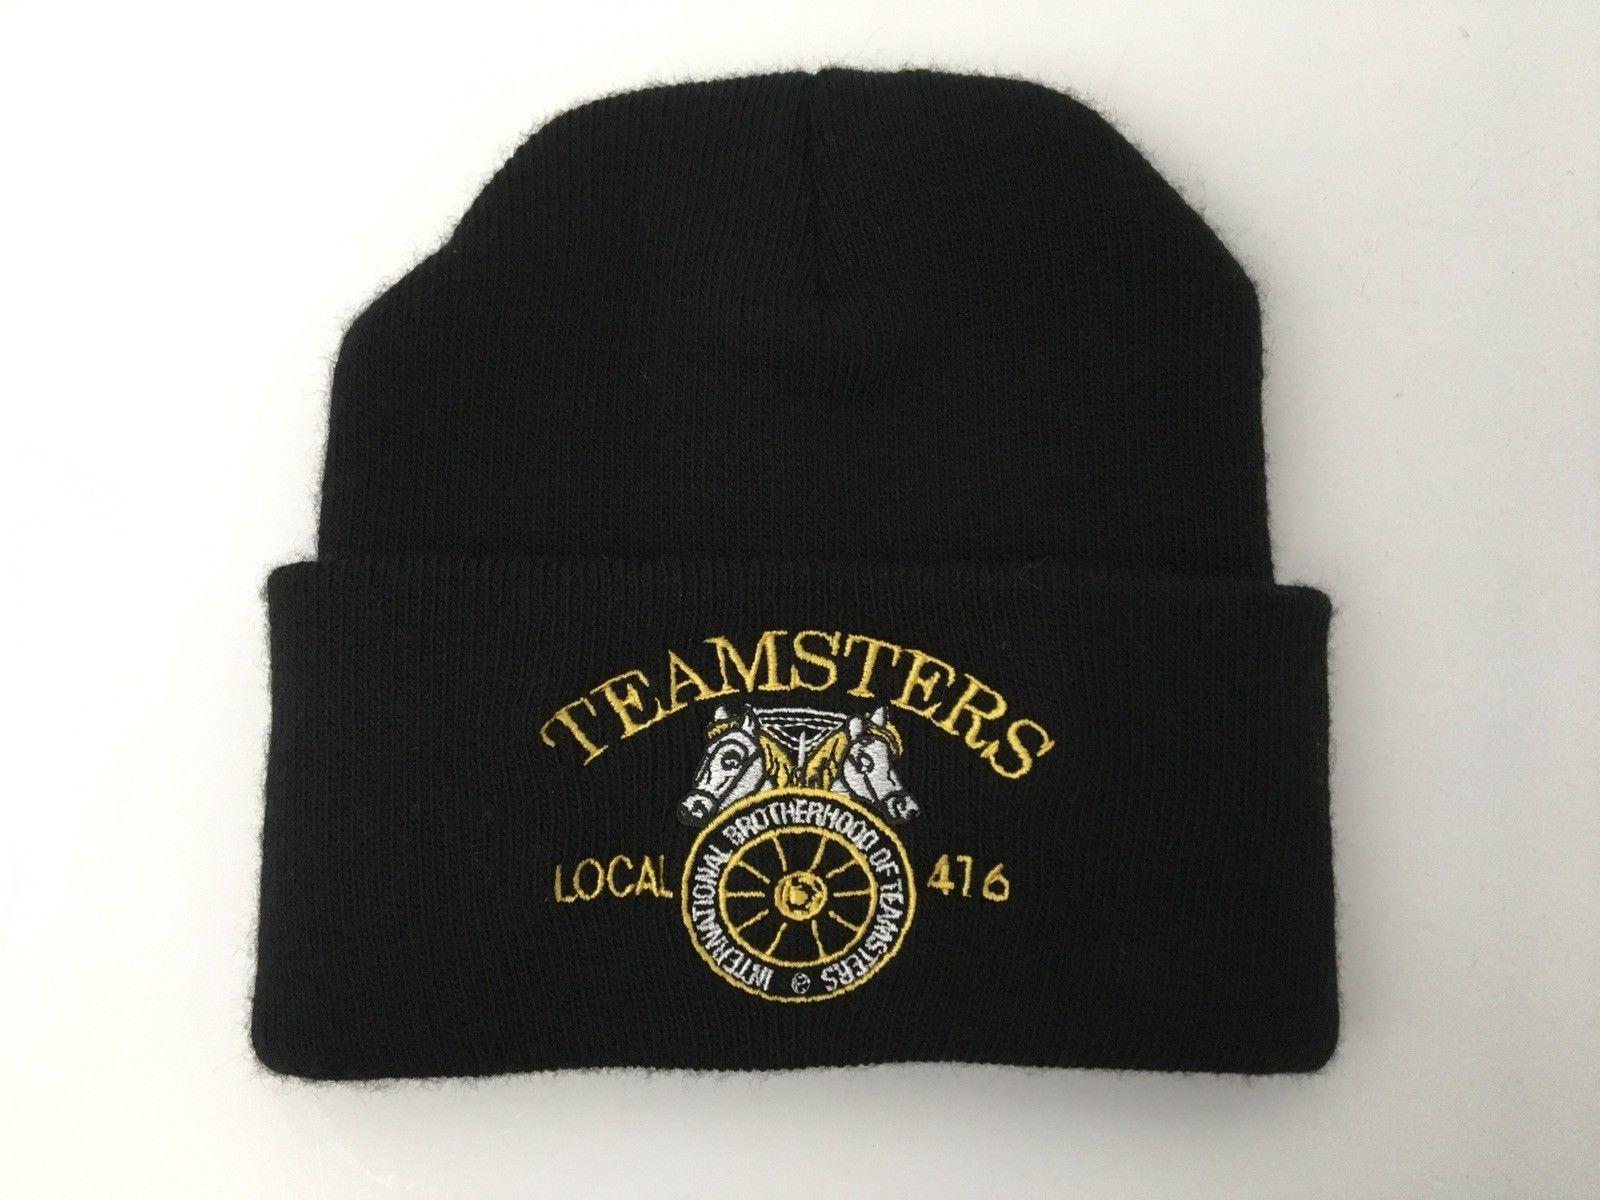 017d46130c156c International Brotherhood Teamsters Local 416 Knit Cap Black Made In USA  NWOT